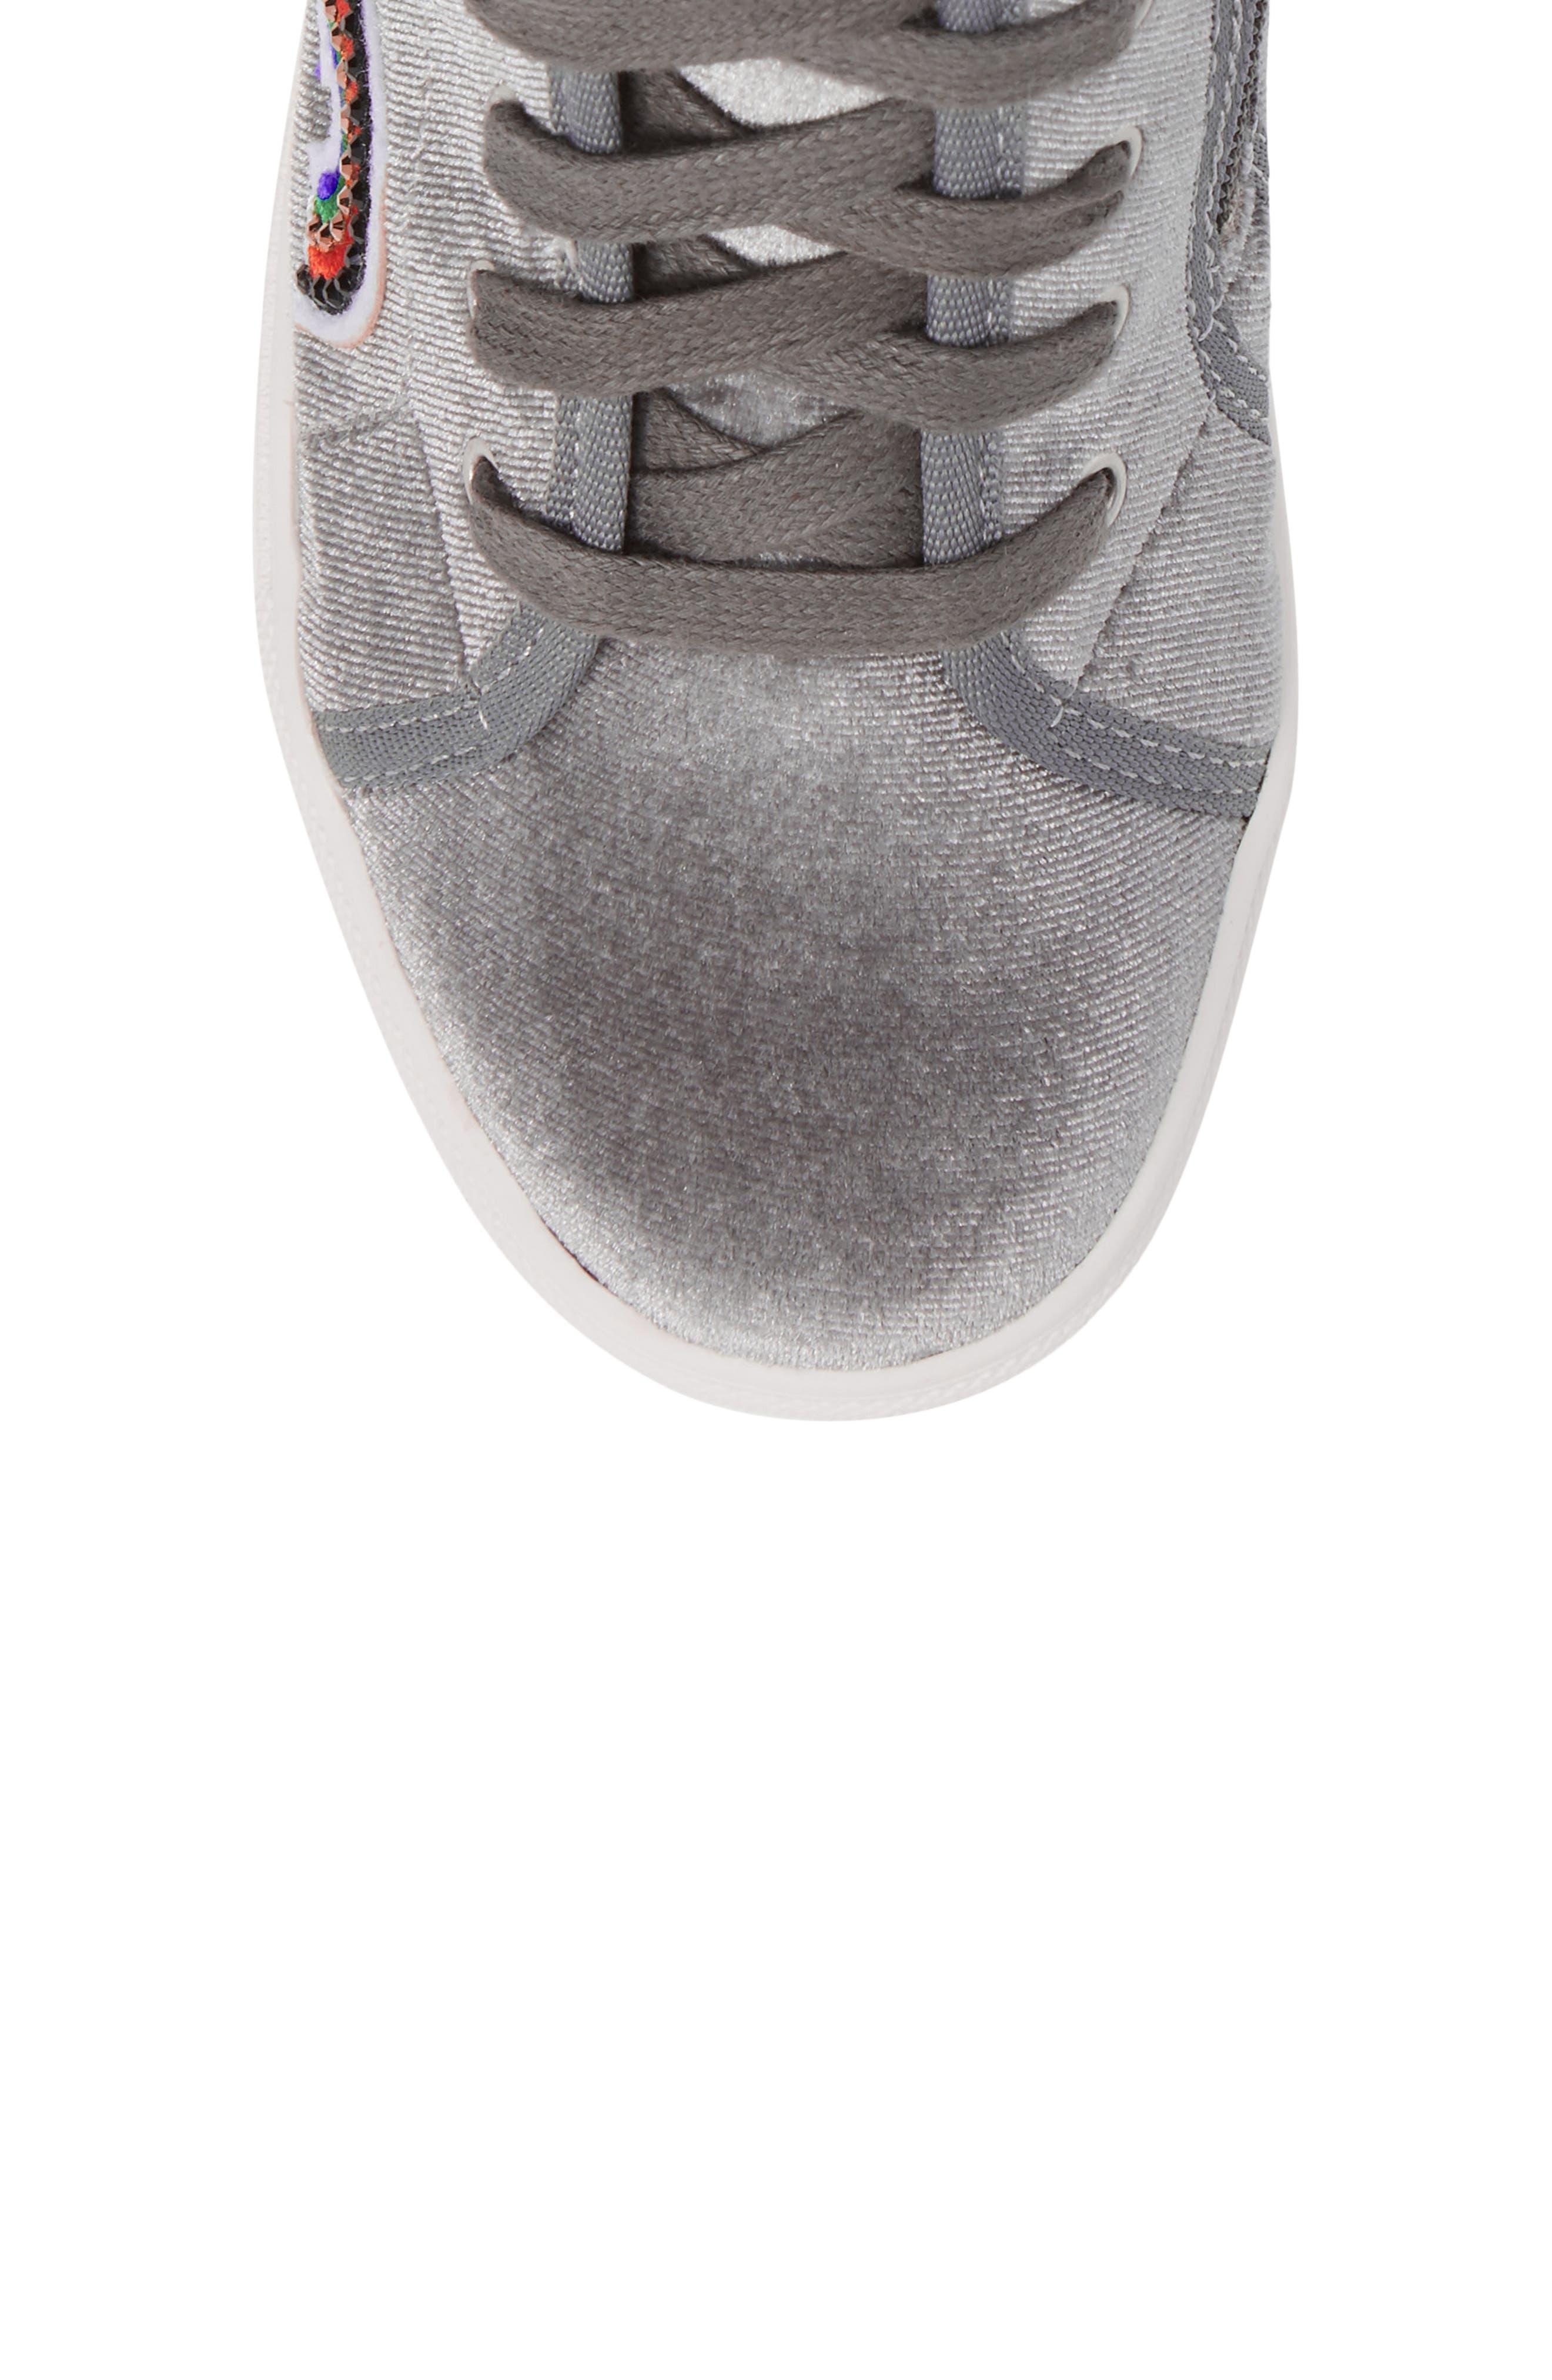 J-BFF High Top Sneaker,                             Alternate thumbnail 5, color,                             055